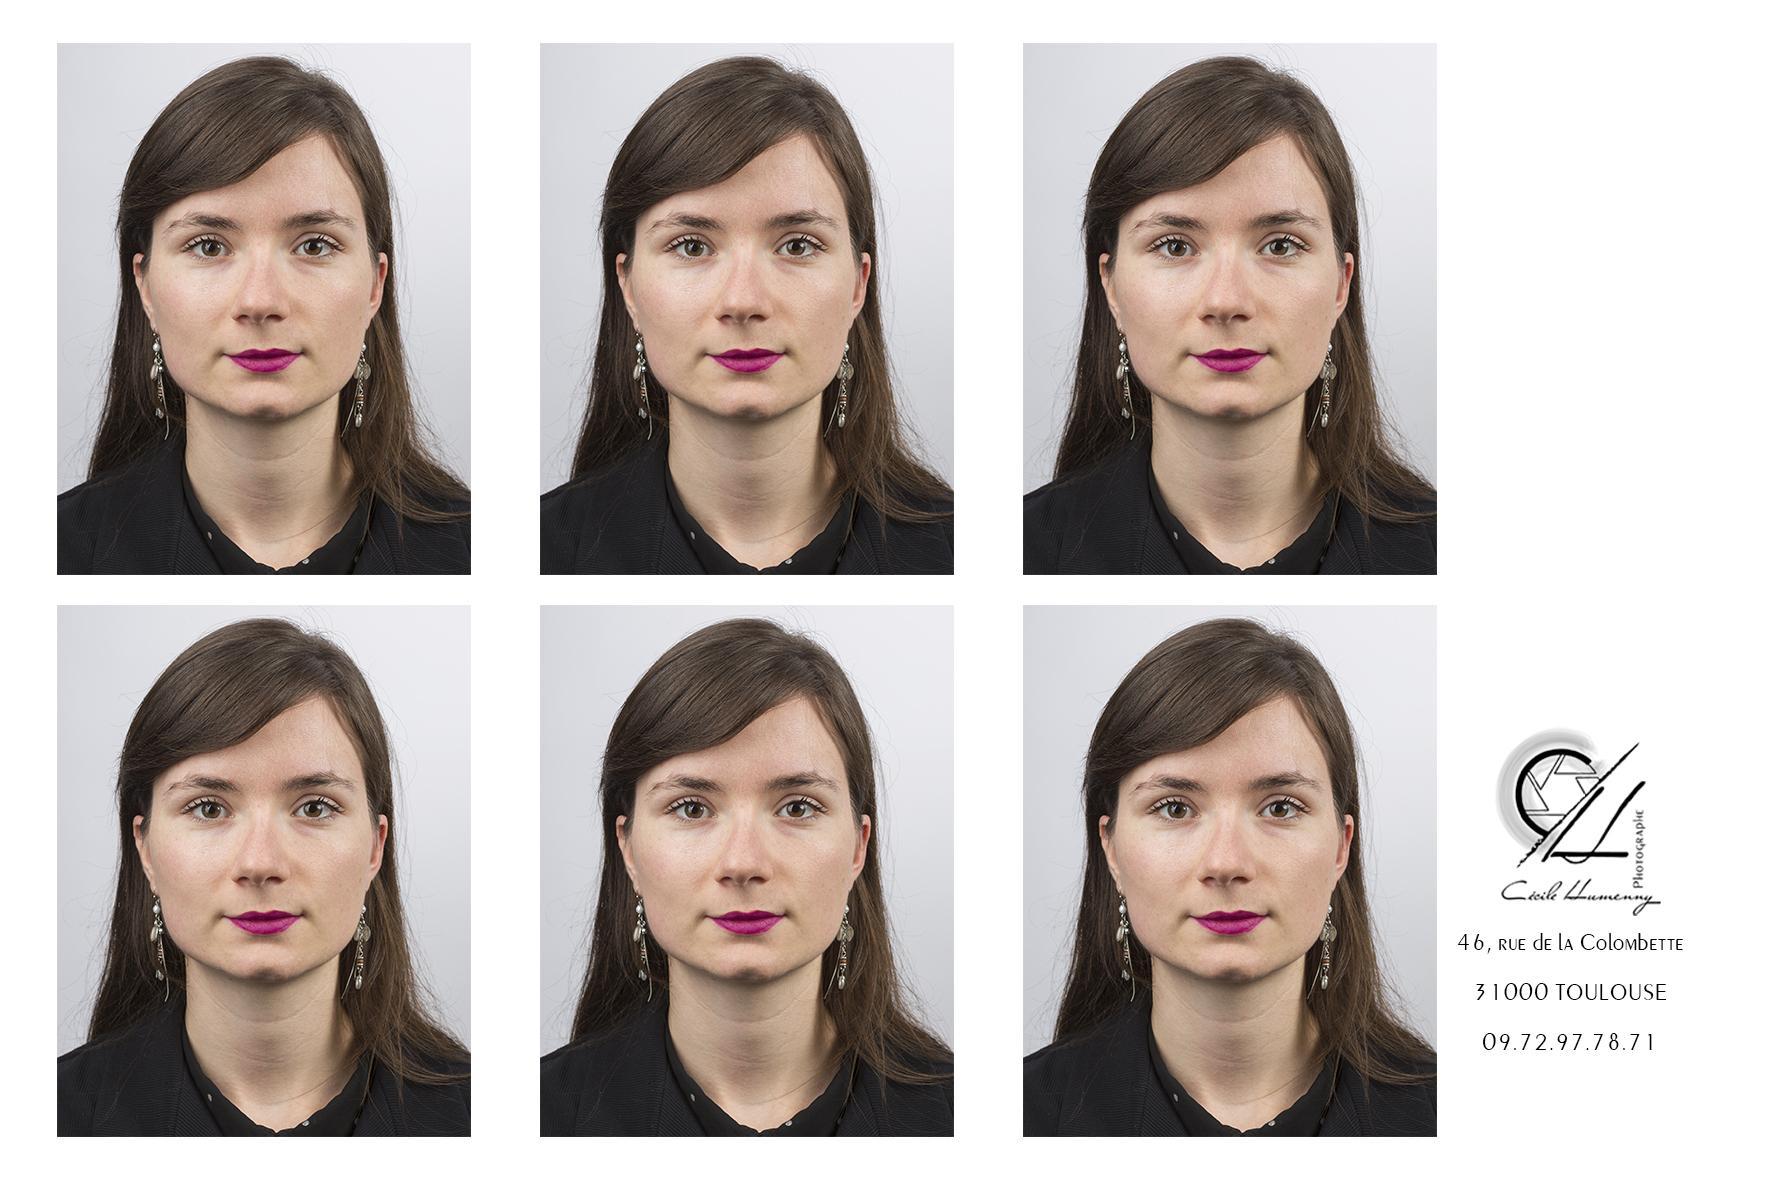 photos d u2019identit u00e9    portraits cv  u2013 c u00e9cile humenny photographe